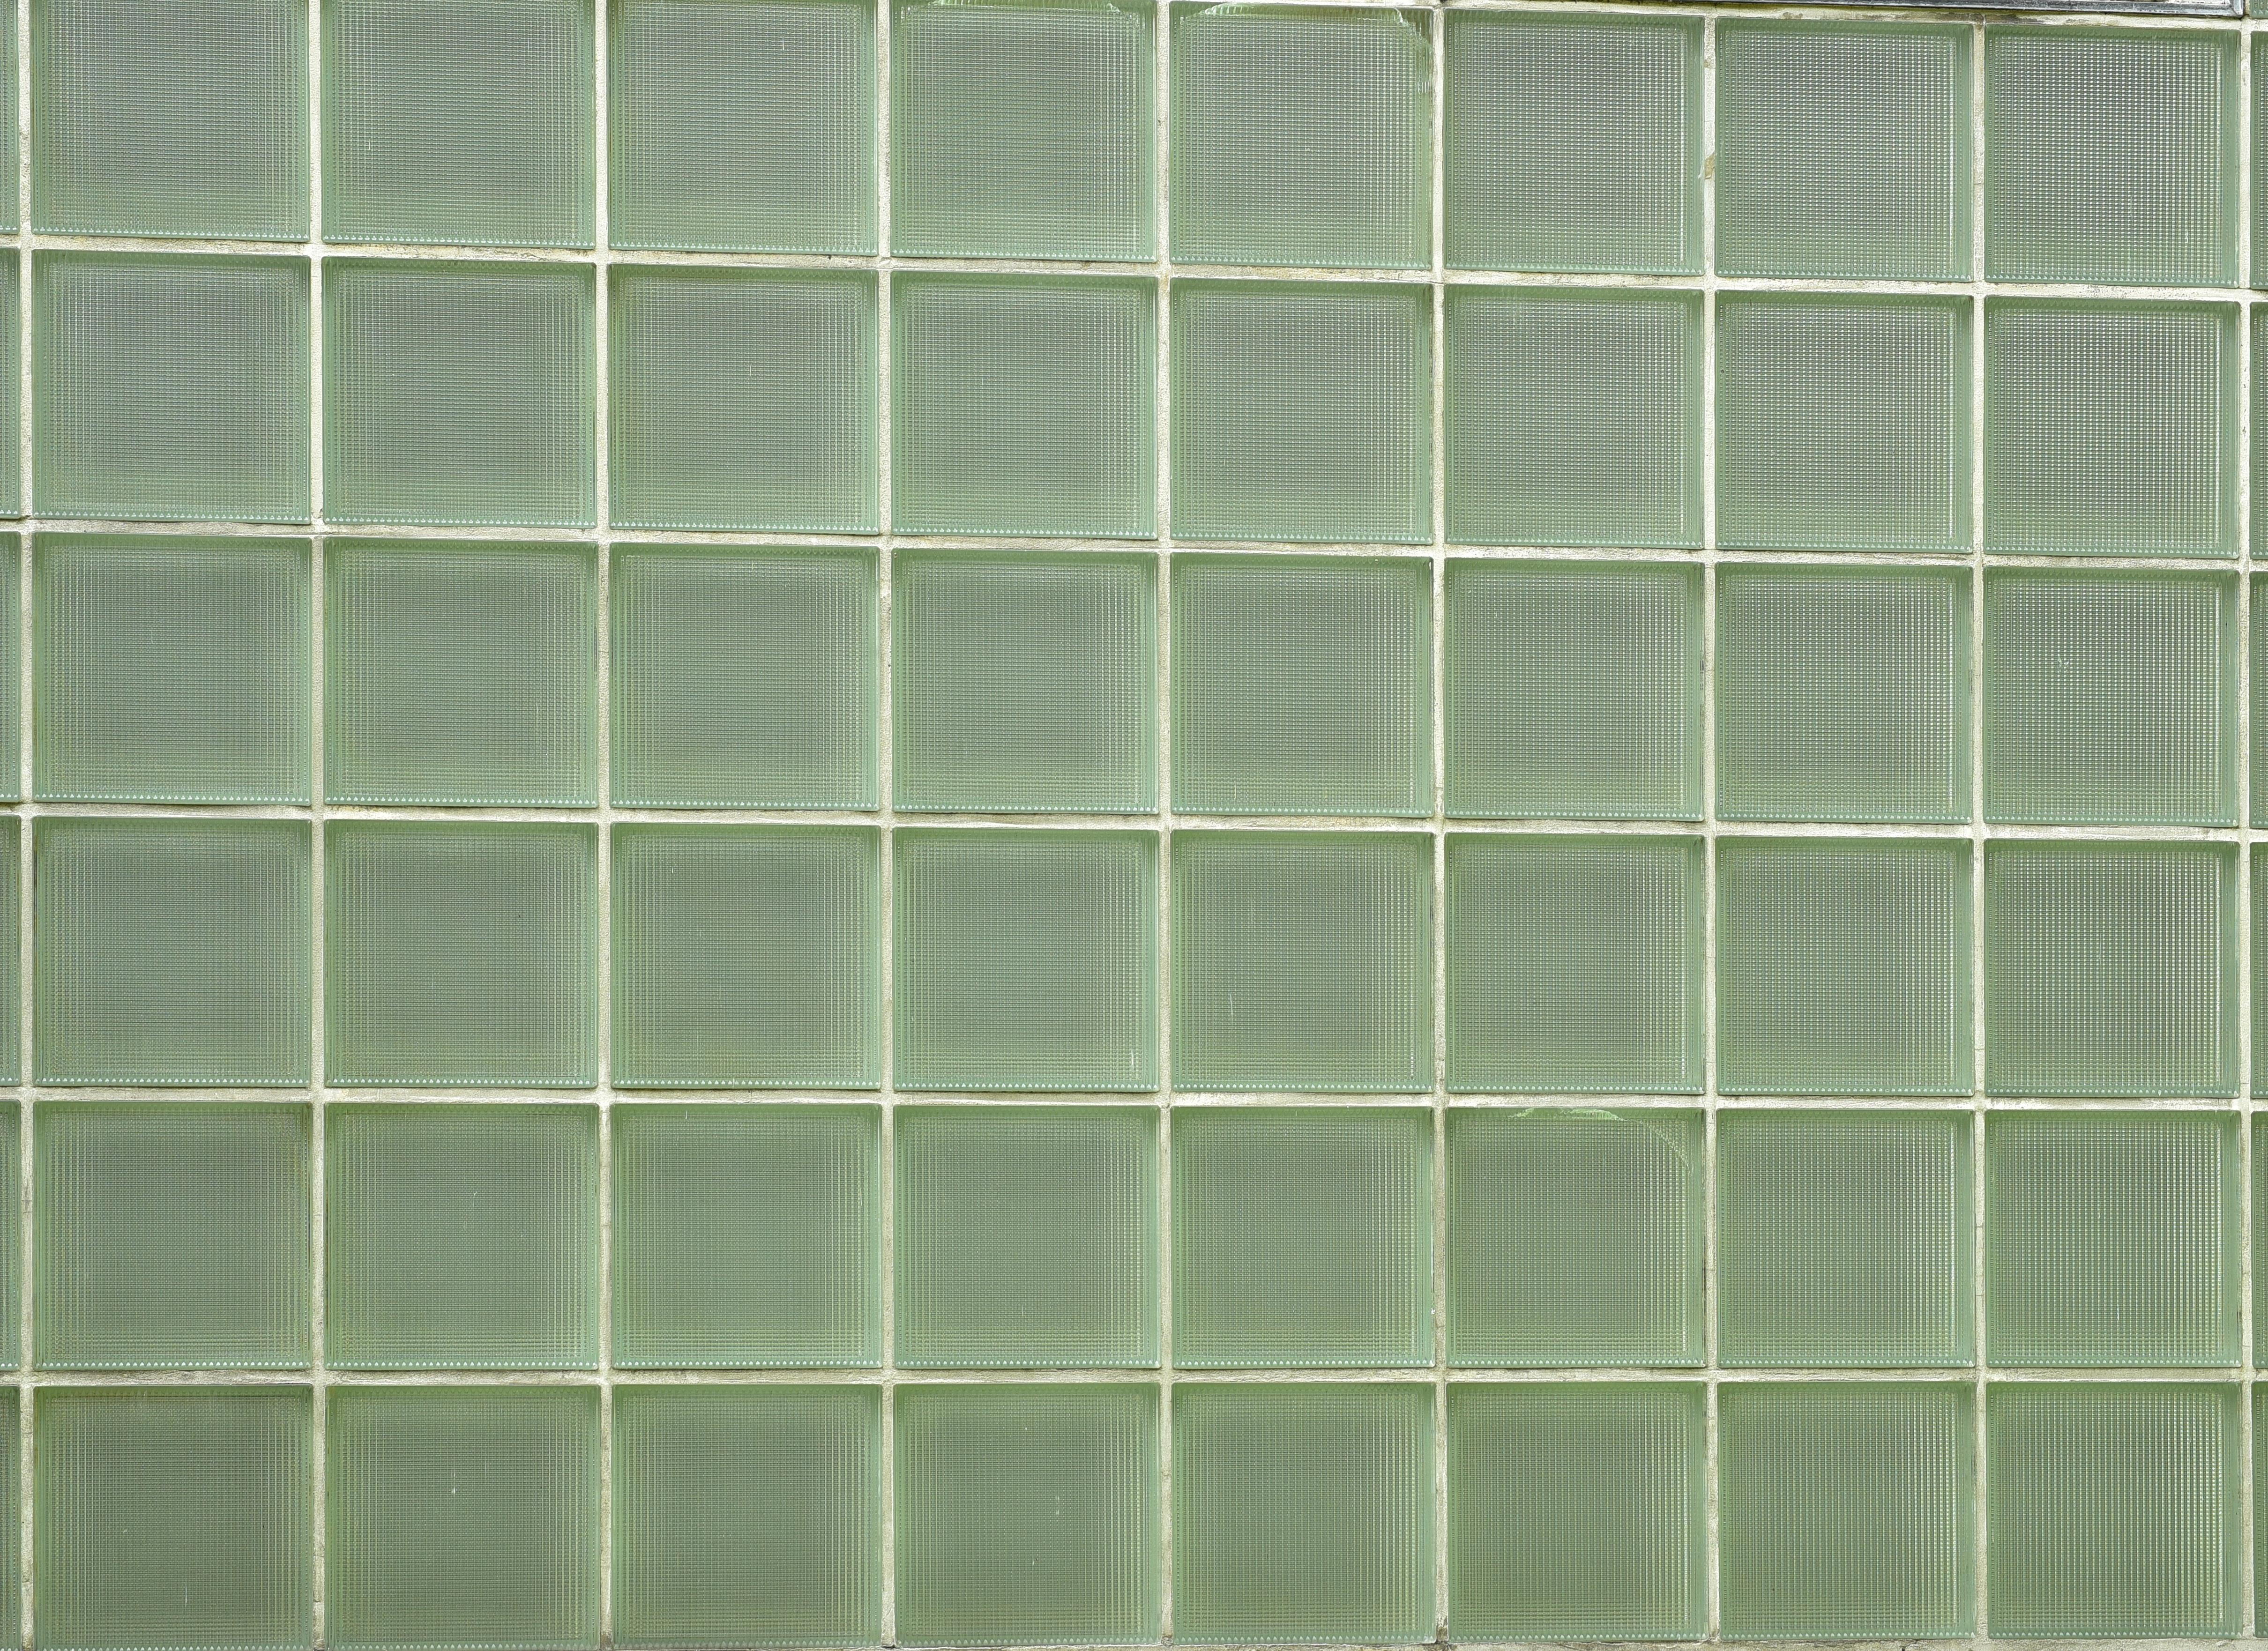 Fotos gratis piso vaso azulejo dise o de interiores - Pared de bloques de vidrio ...